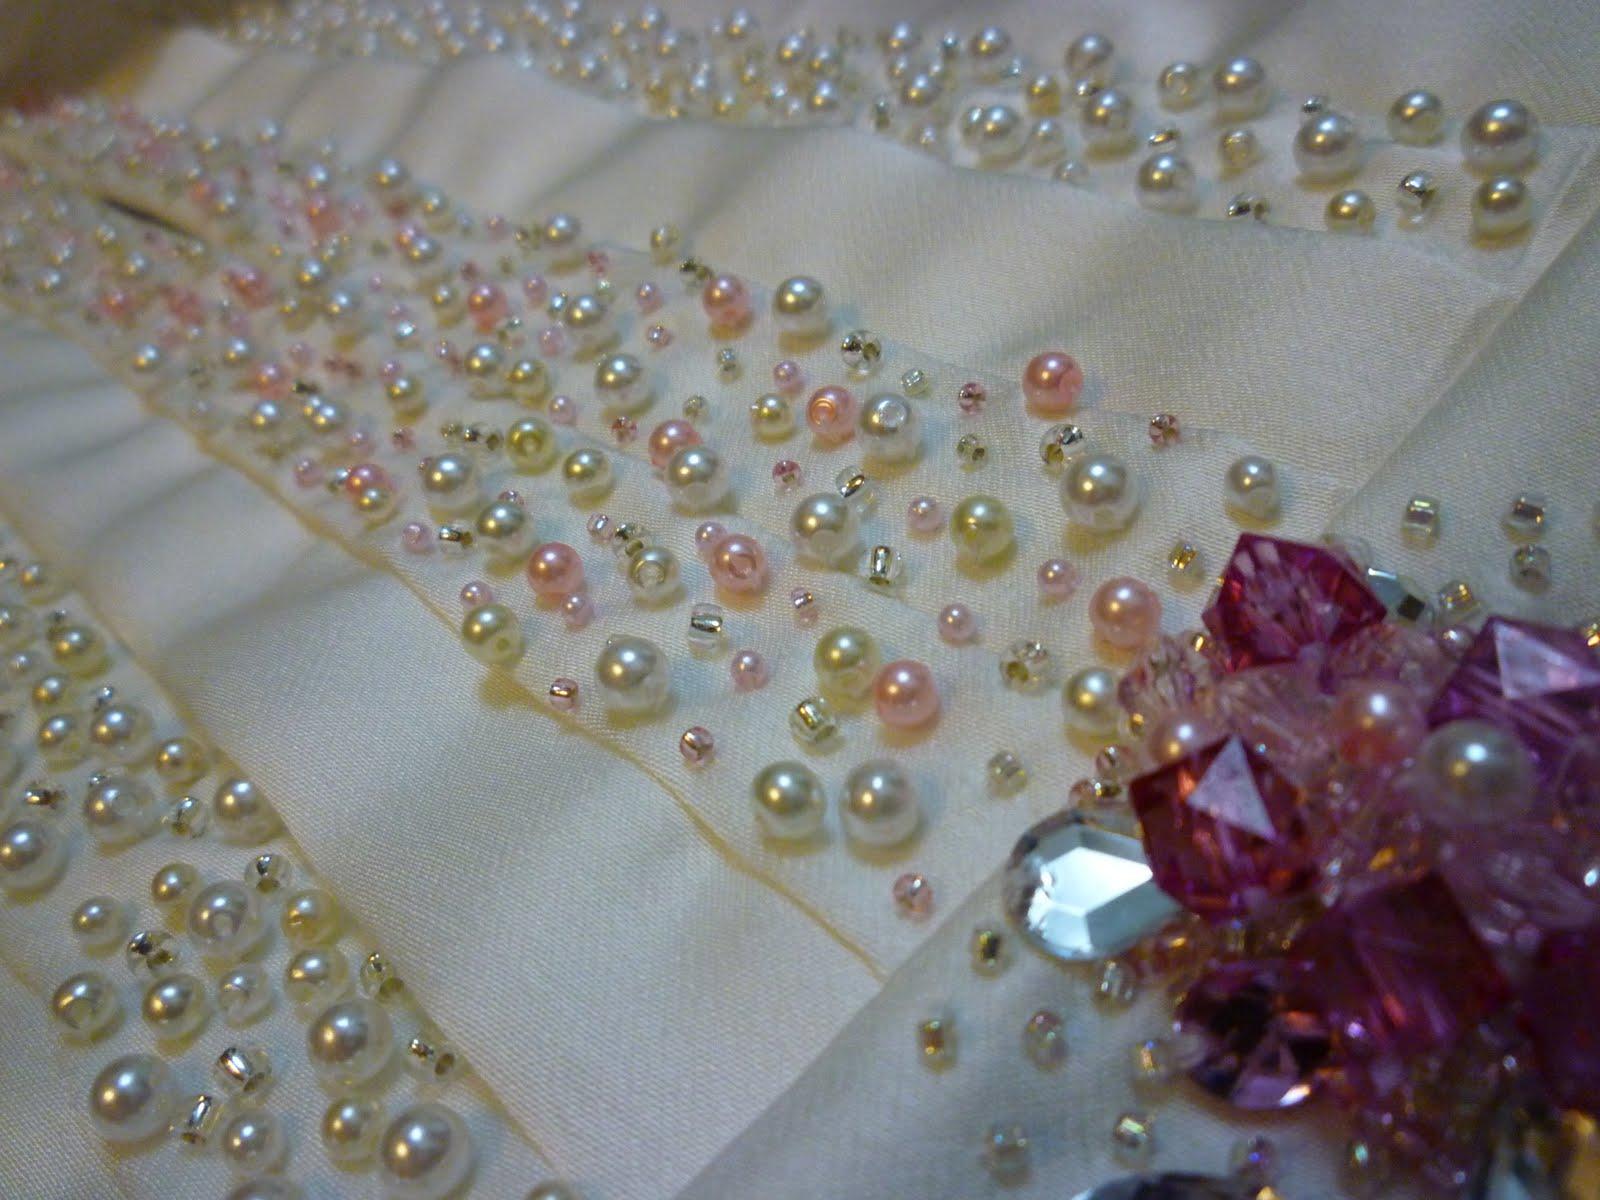 Manik Pearl Design | Joy Studio Design Gallery - Best Design